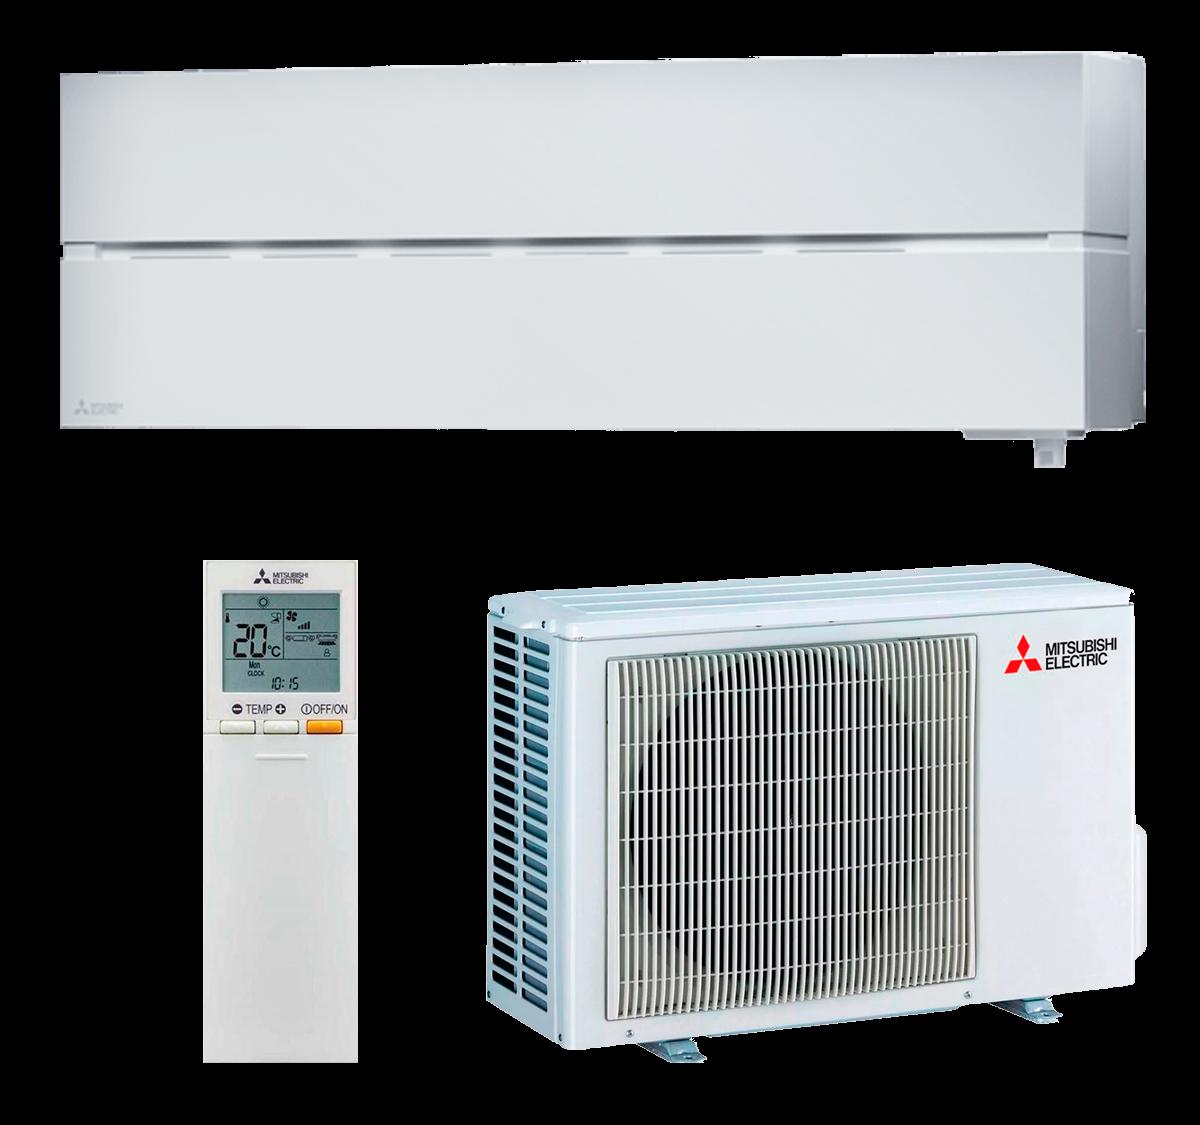 aire acondicionado split blanco mitsubishi electric inverter serie kirigamine style modelo msz ln35vgw precio incluido instalacion caseragua 03